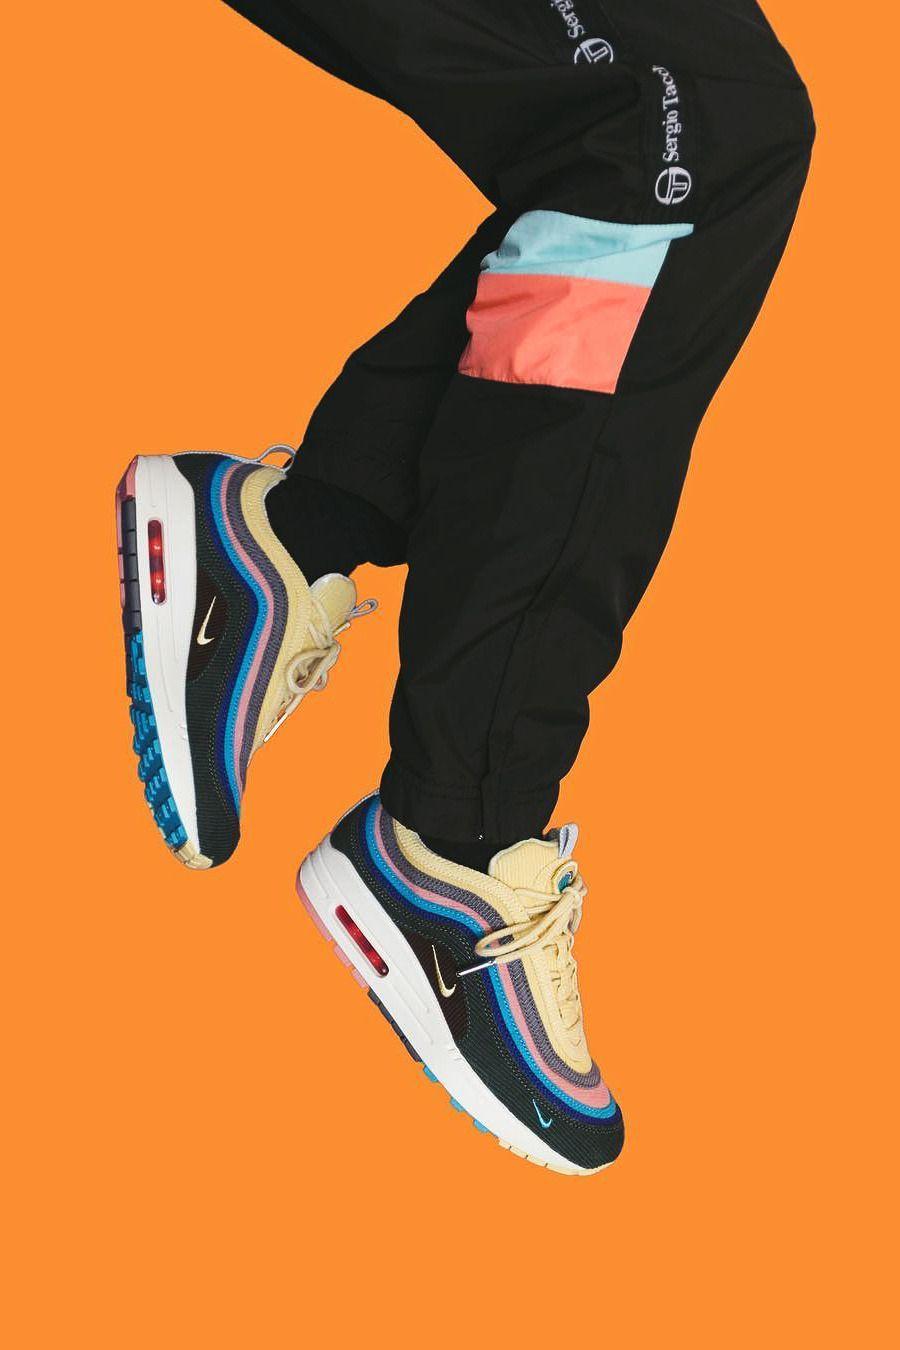 Nike Air Max 97 Wallpapers - Top Free